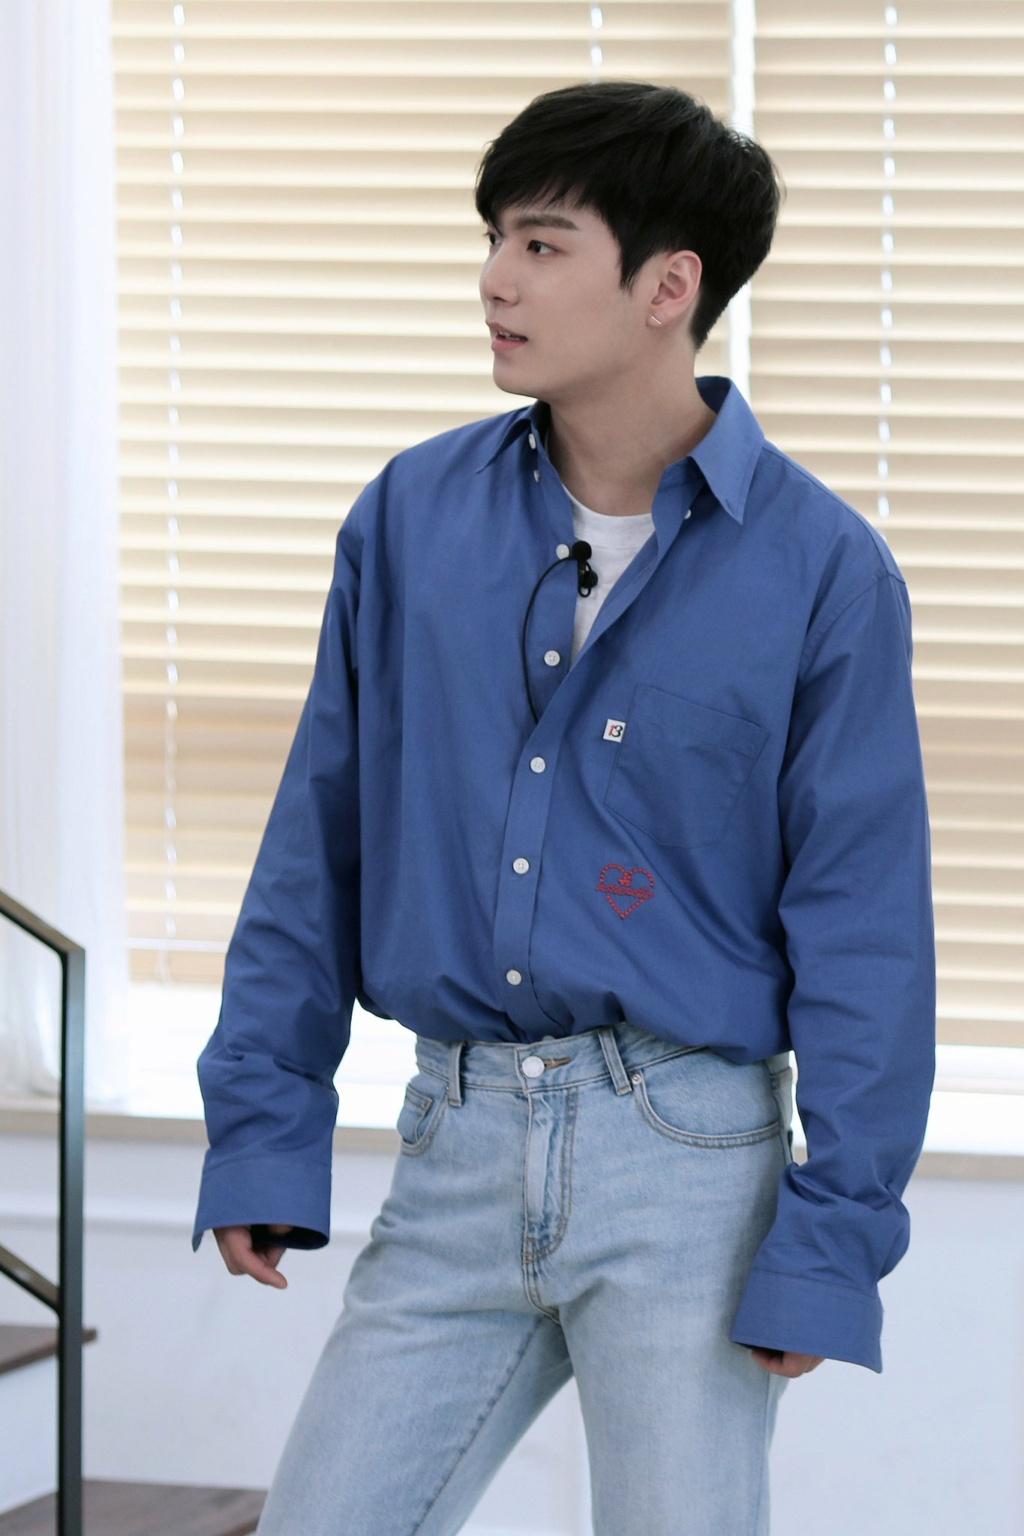 Qual seu estilo (roupa)? Etcptl10